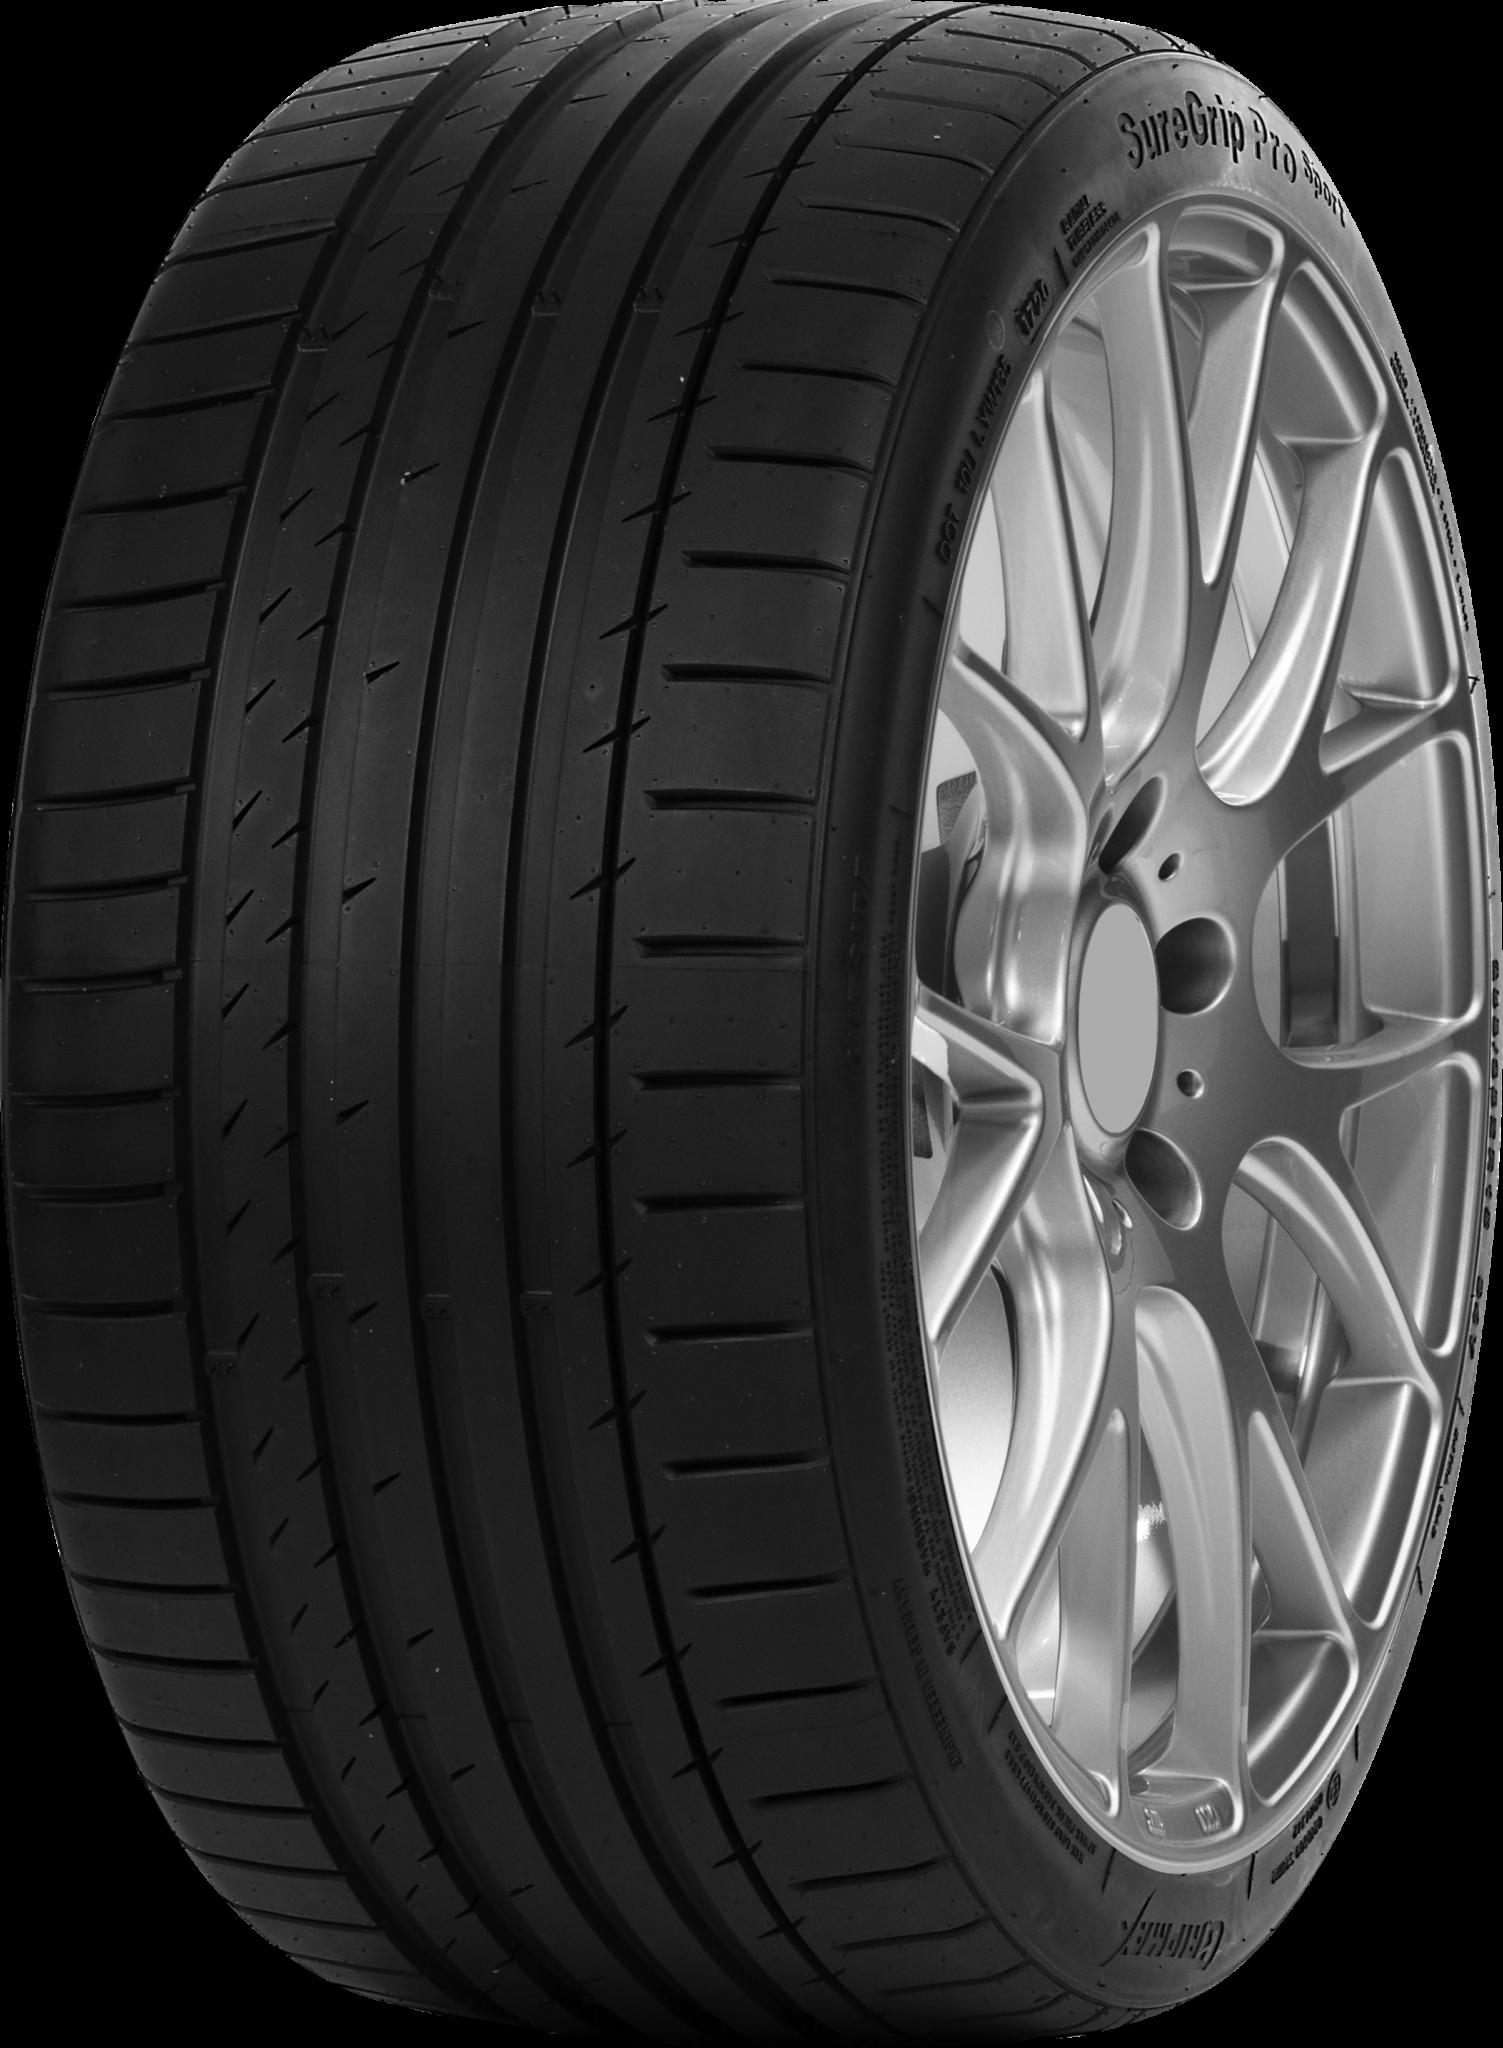 Van den Ban Group offers new Gripmax UHP tyre